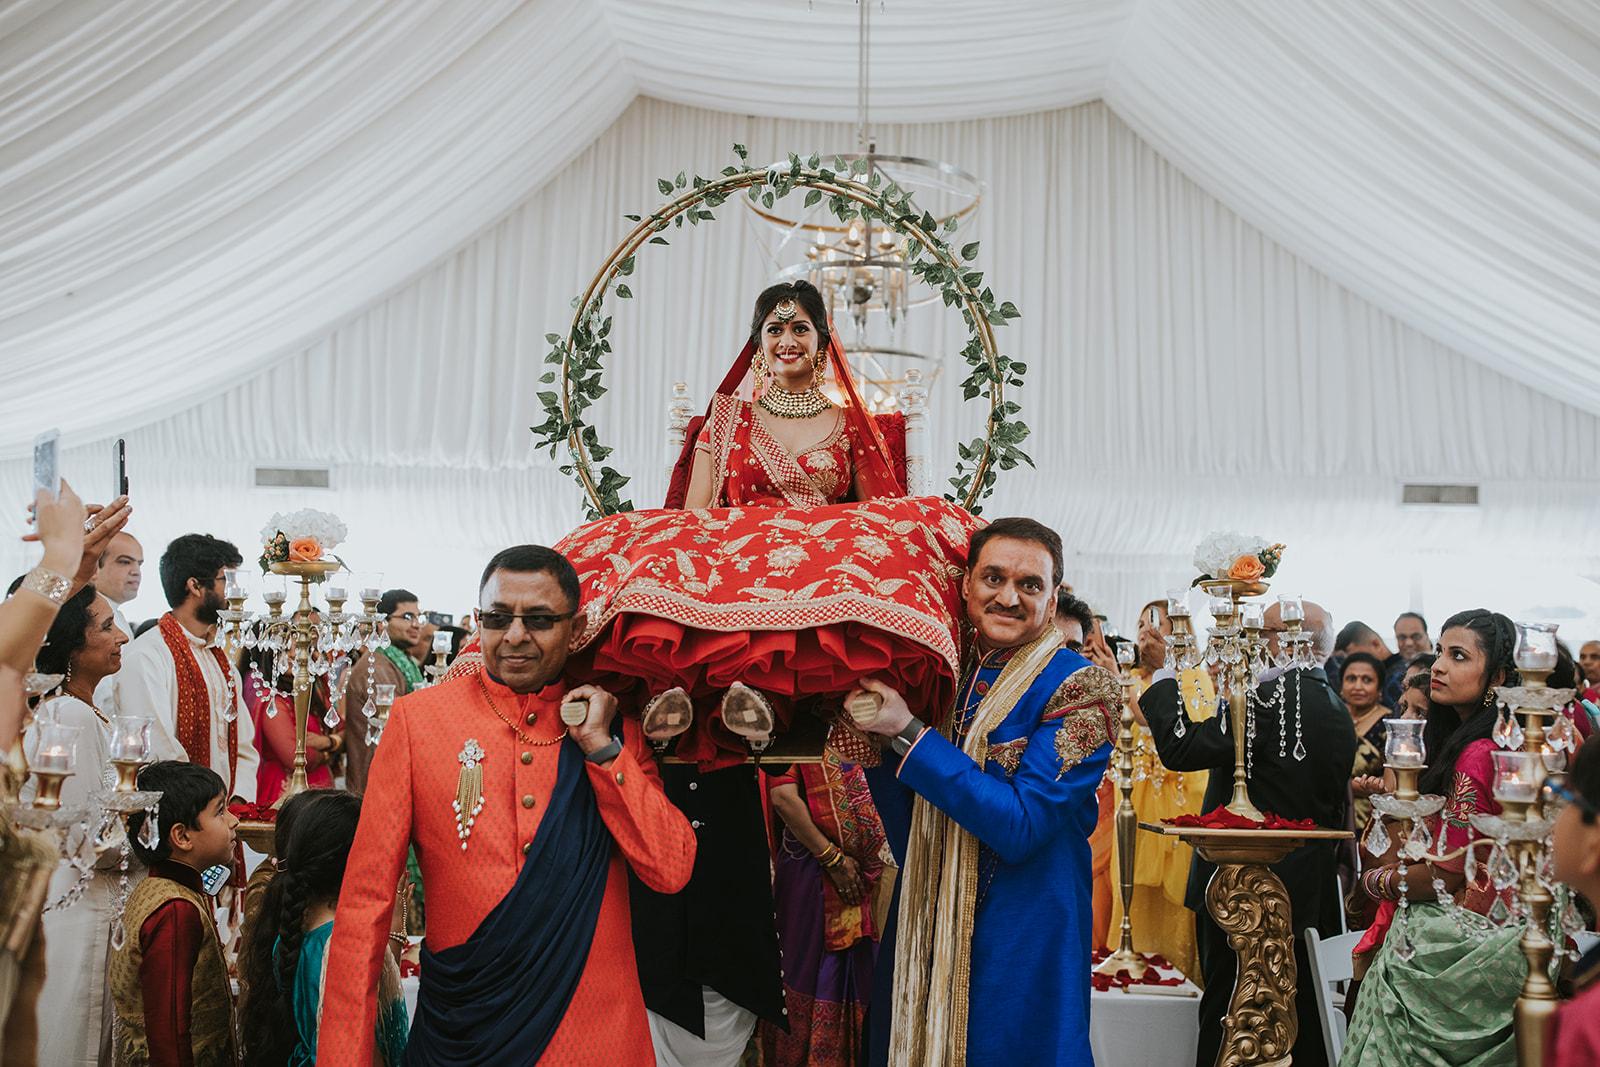 DAY 4 - Wedding Day